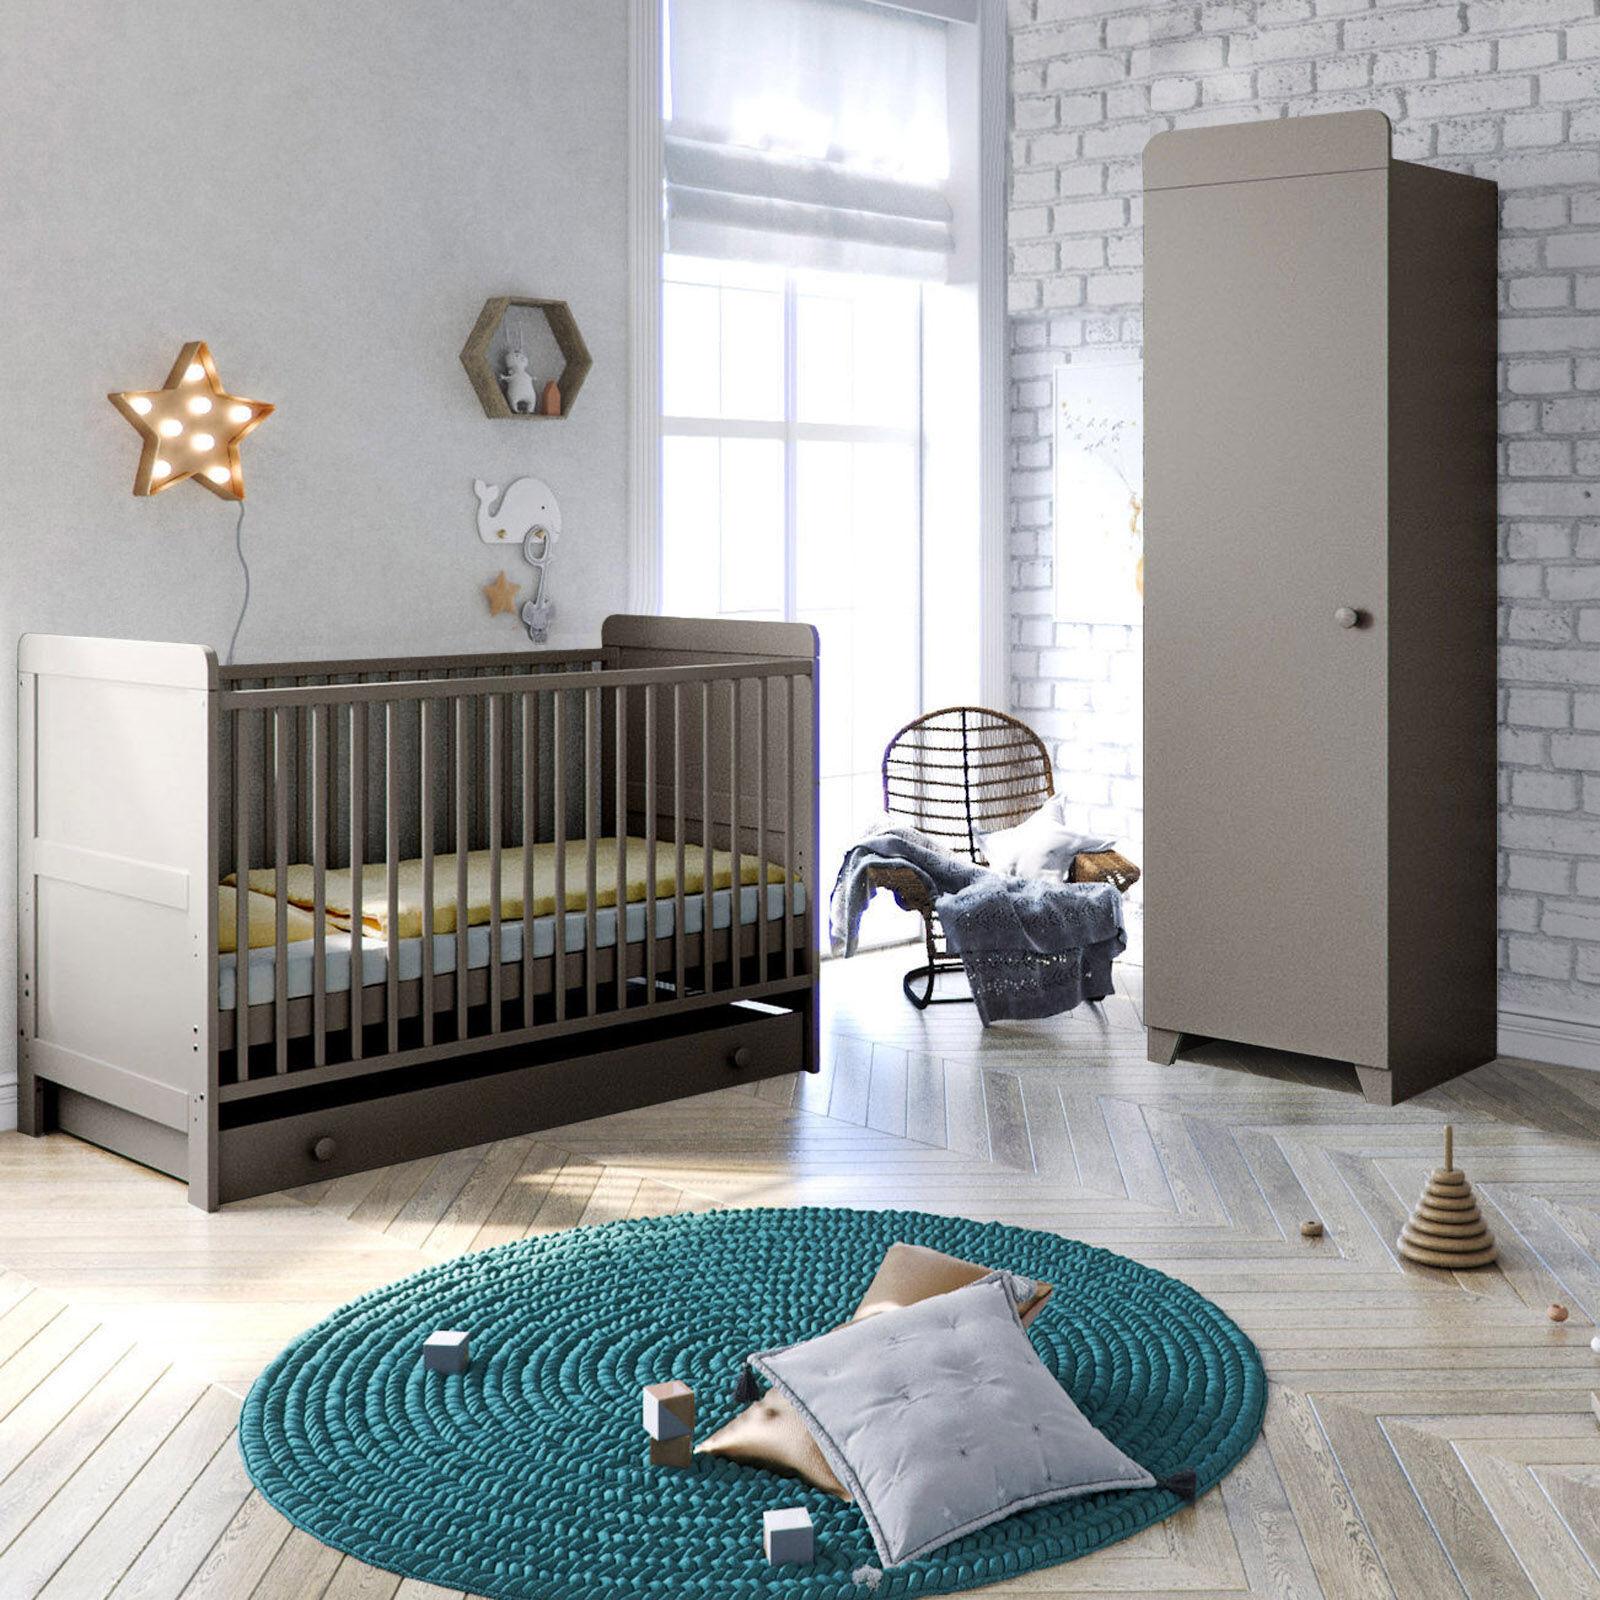 Little Acorns Classic Milano Cot Bed and Single Wardrobe - Light Grey